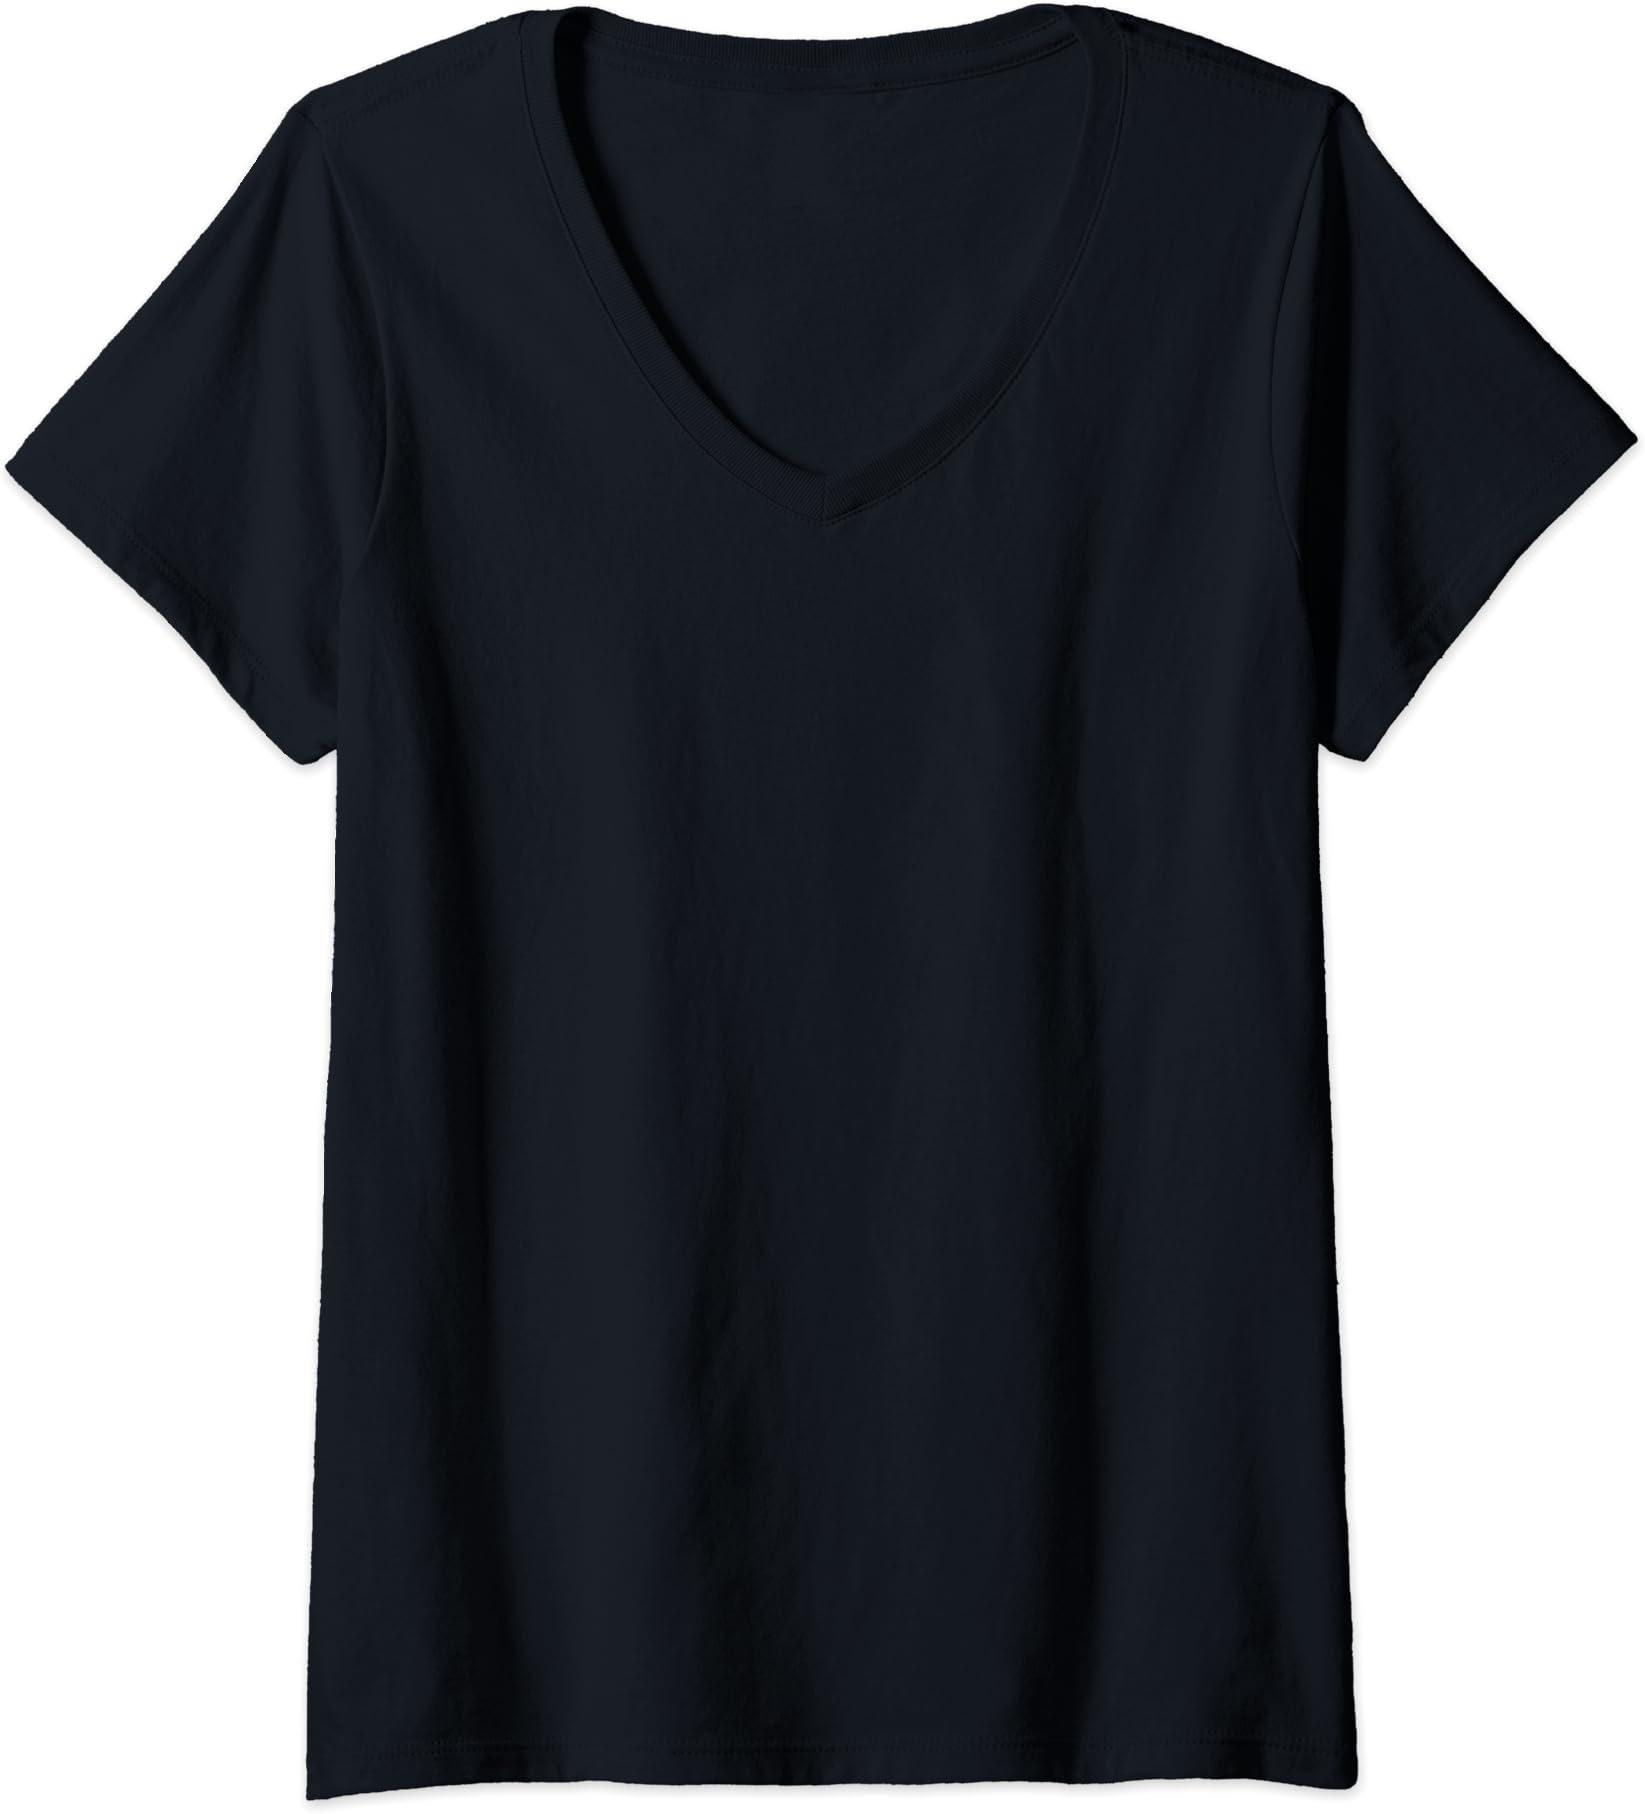 Navy Mom Mother Military Armed Forces Patriotic USA Pride Mens V-neck T-shirt